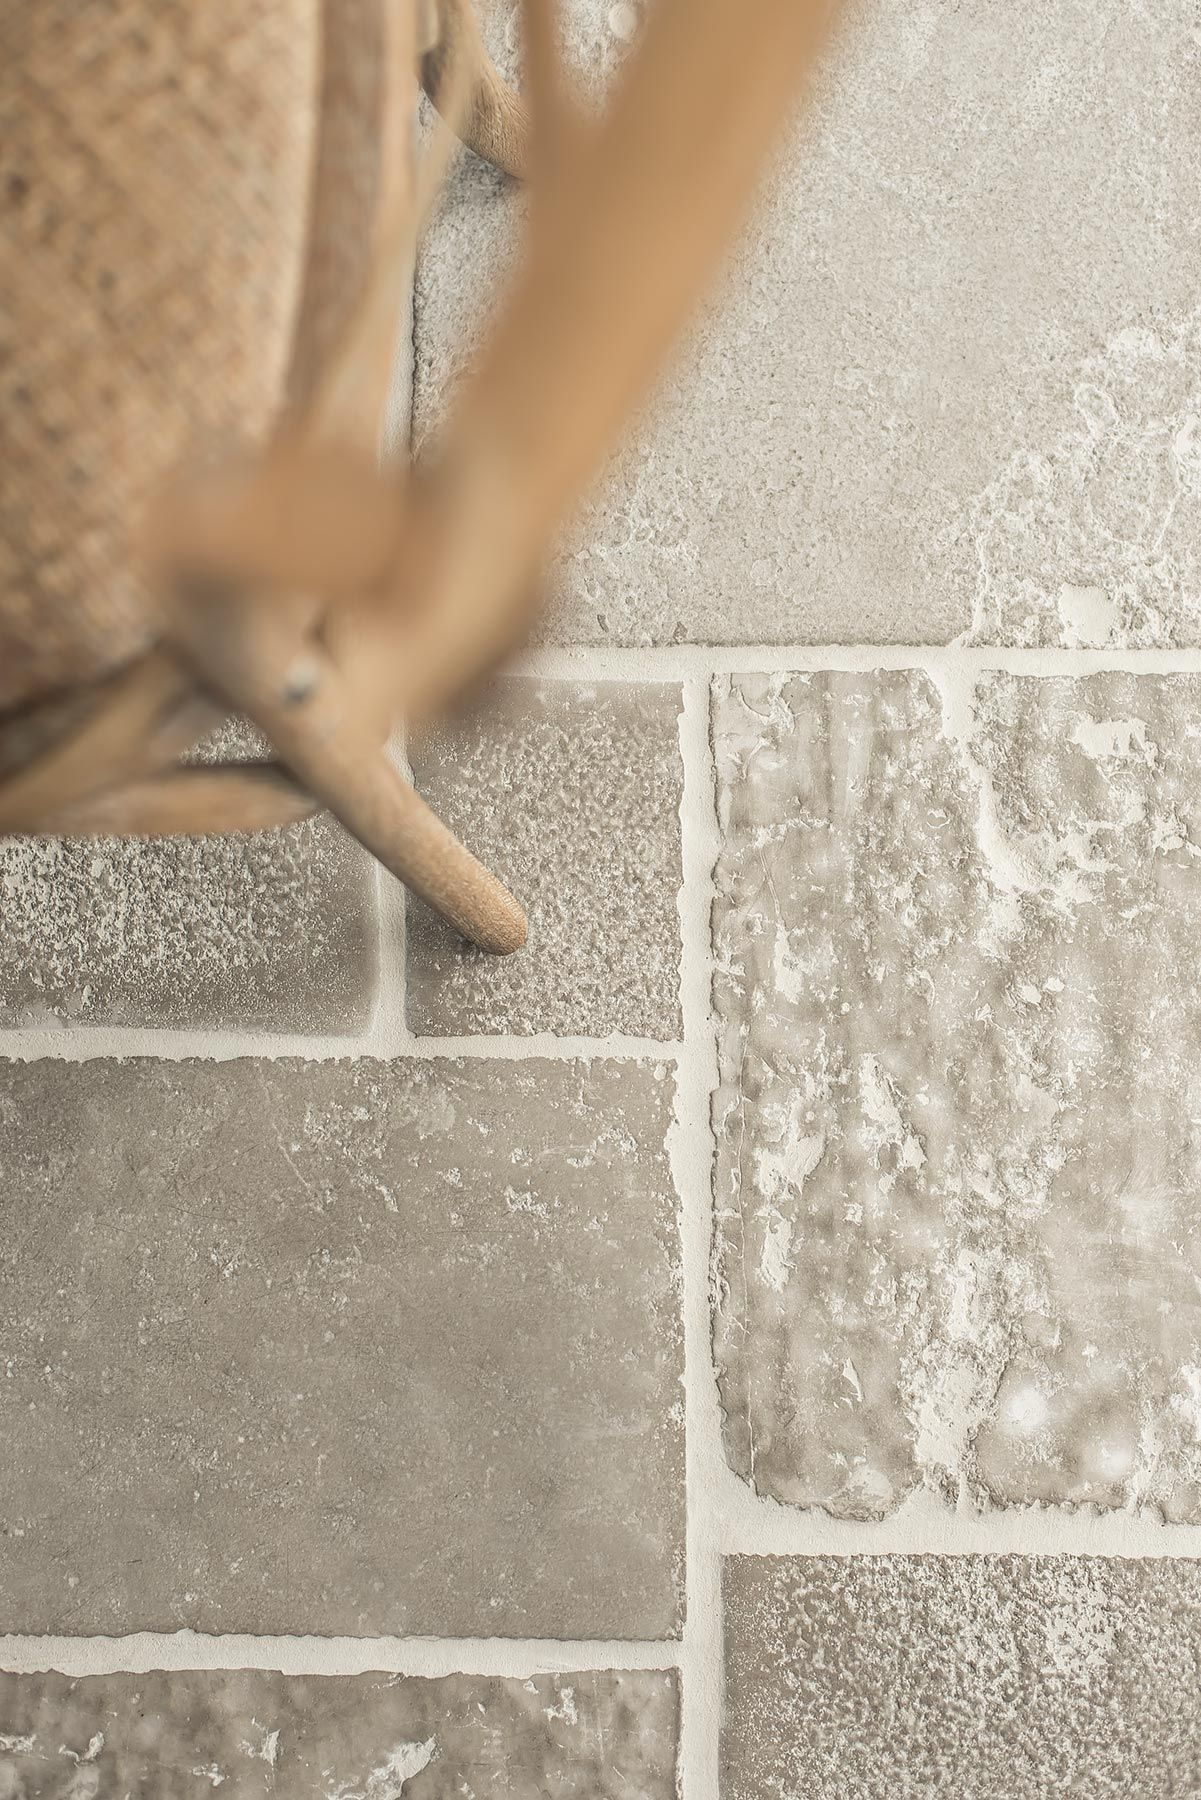 raw stones vloeren stenen kerkvloer vloerverwarming